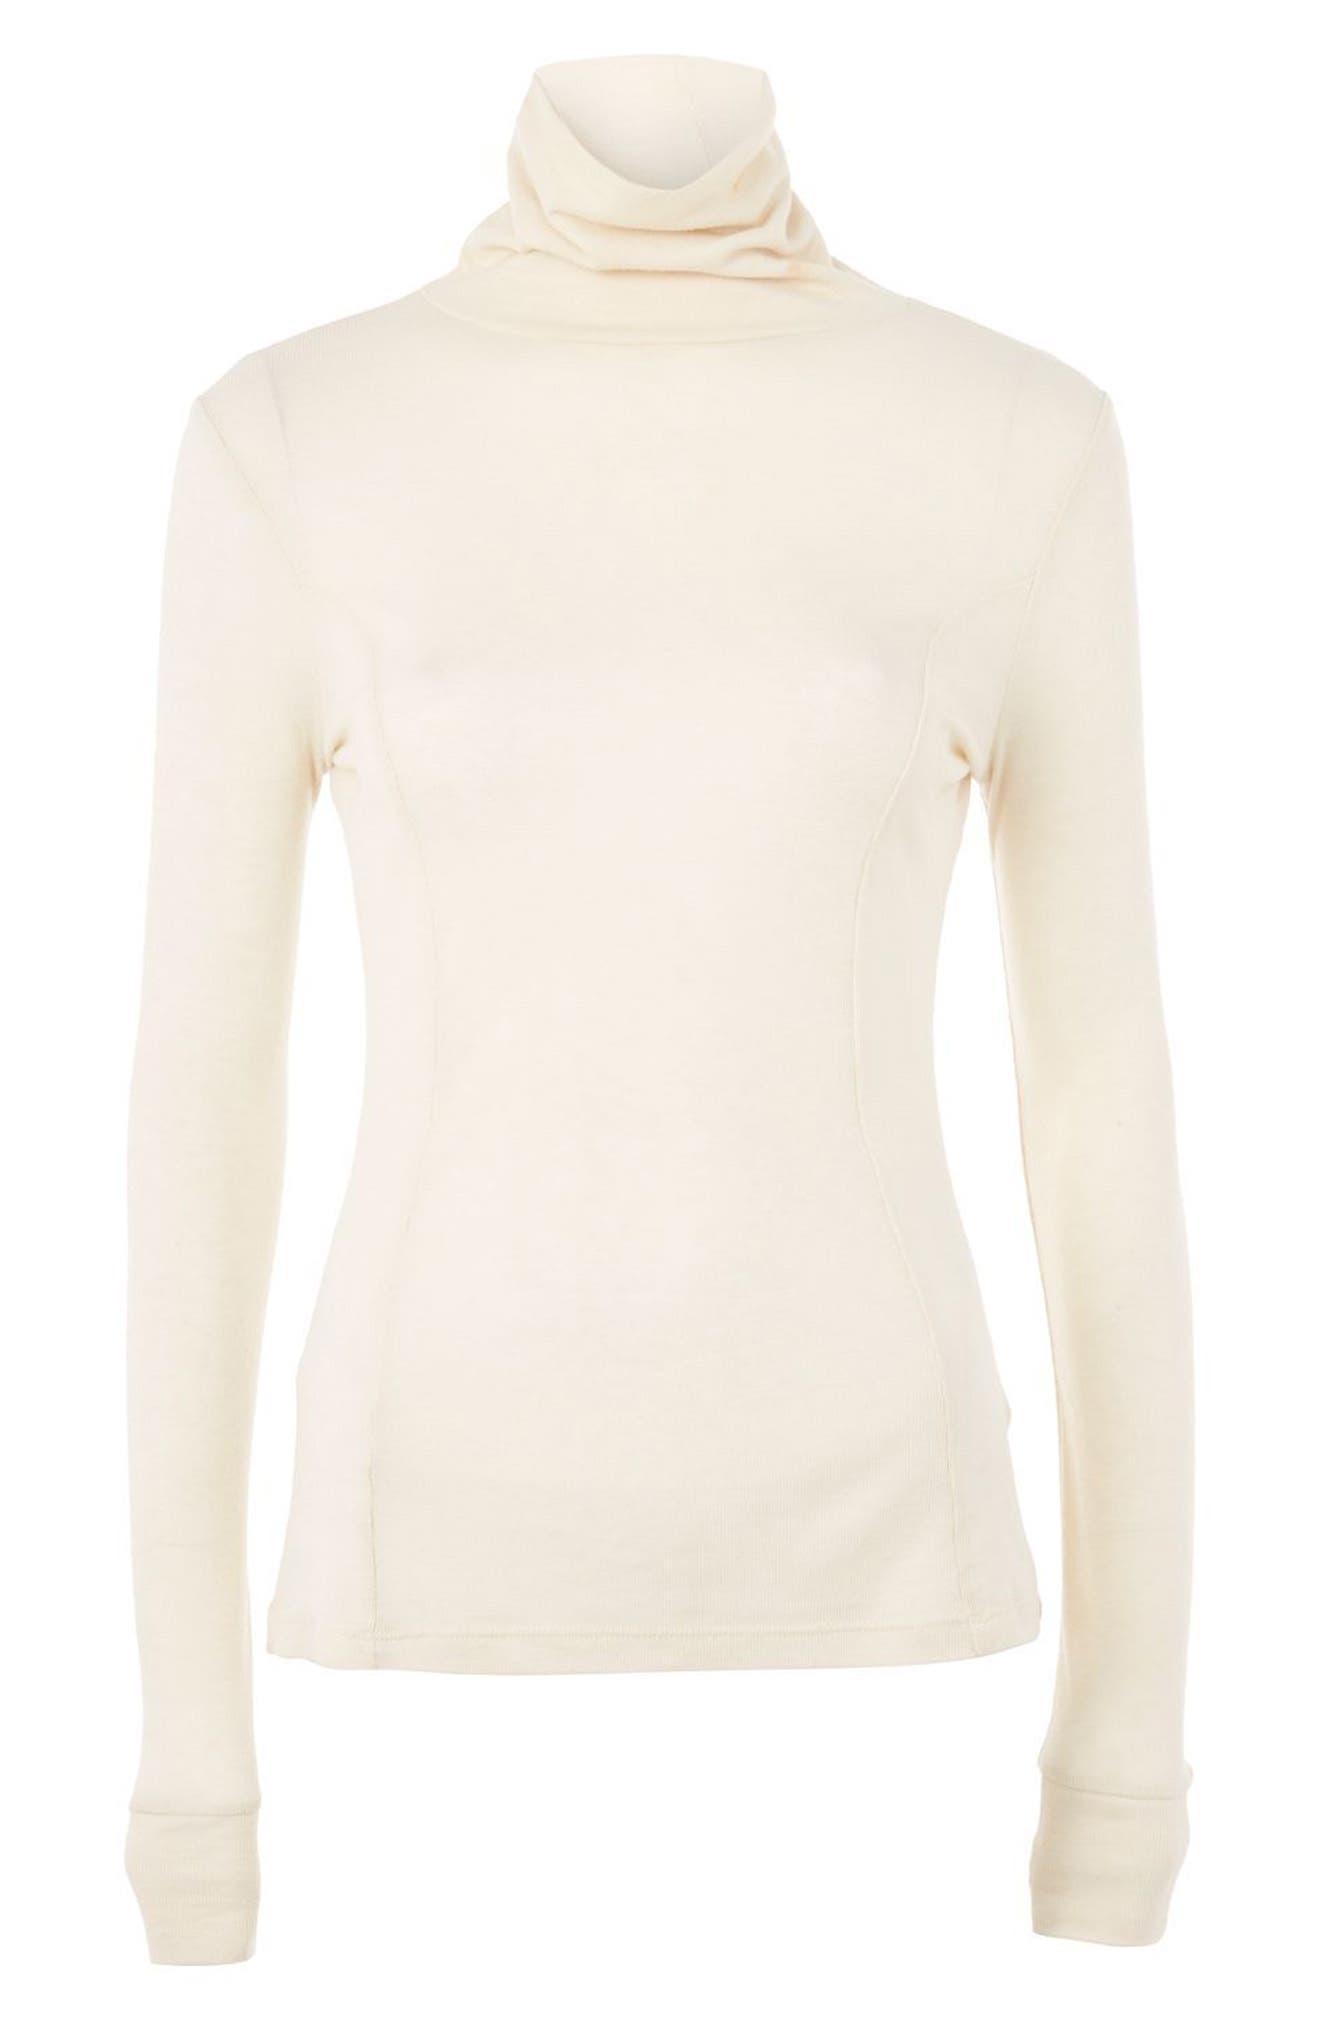 Wool Turtleneck Sweater,                             Main thumbnail 1, color,                             Cream